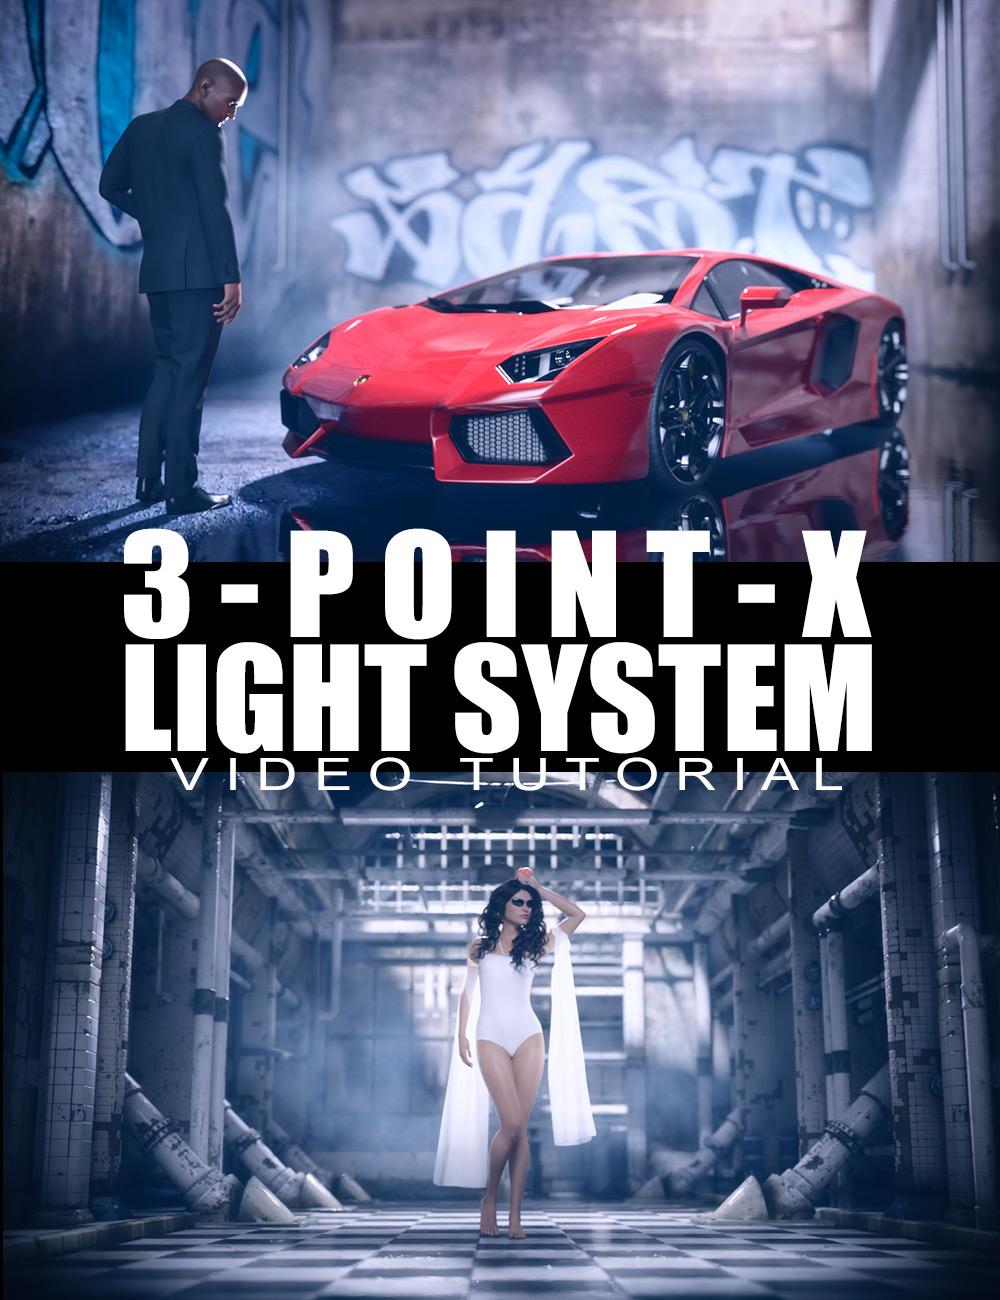 3 Point X Light System - Video Tutorial by: Dreamlight, 3D Models by Daz 3D